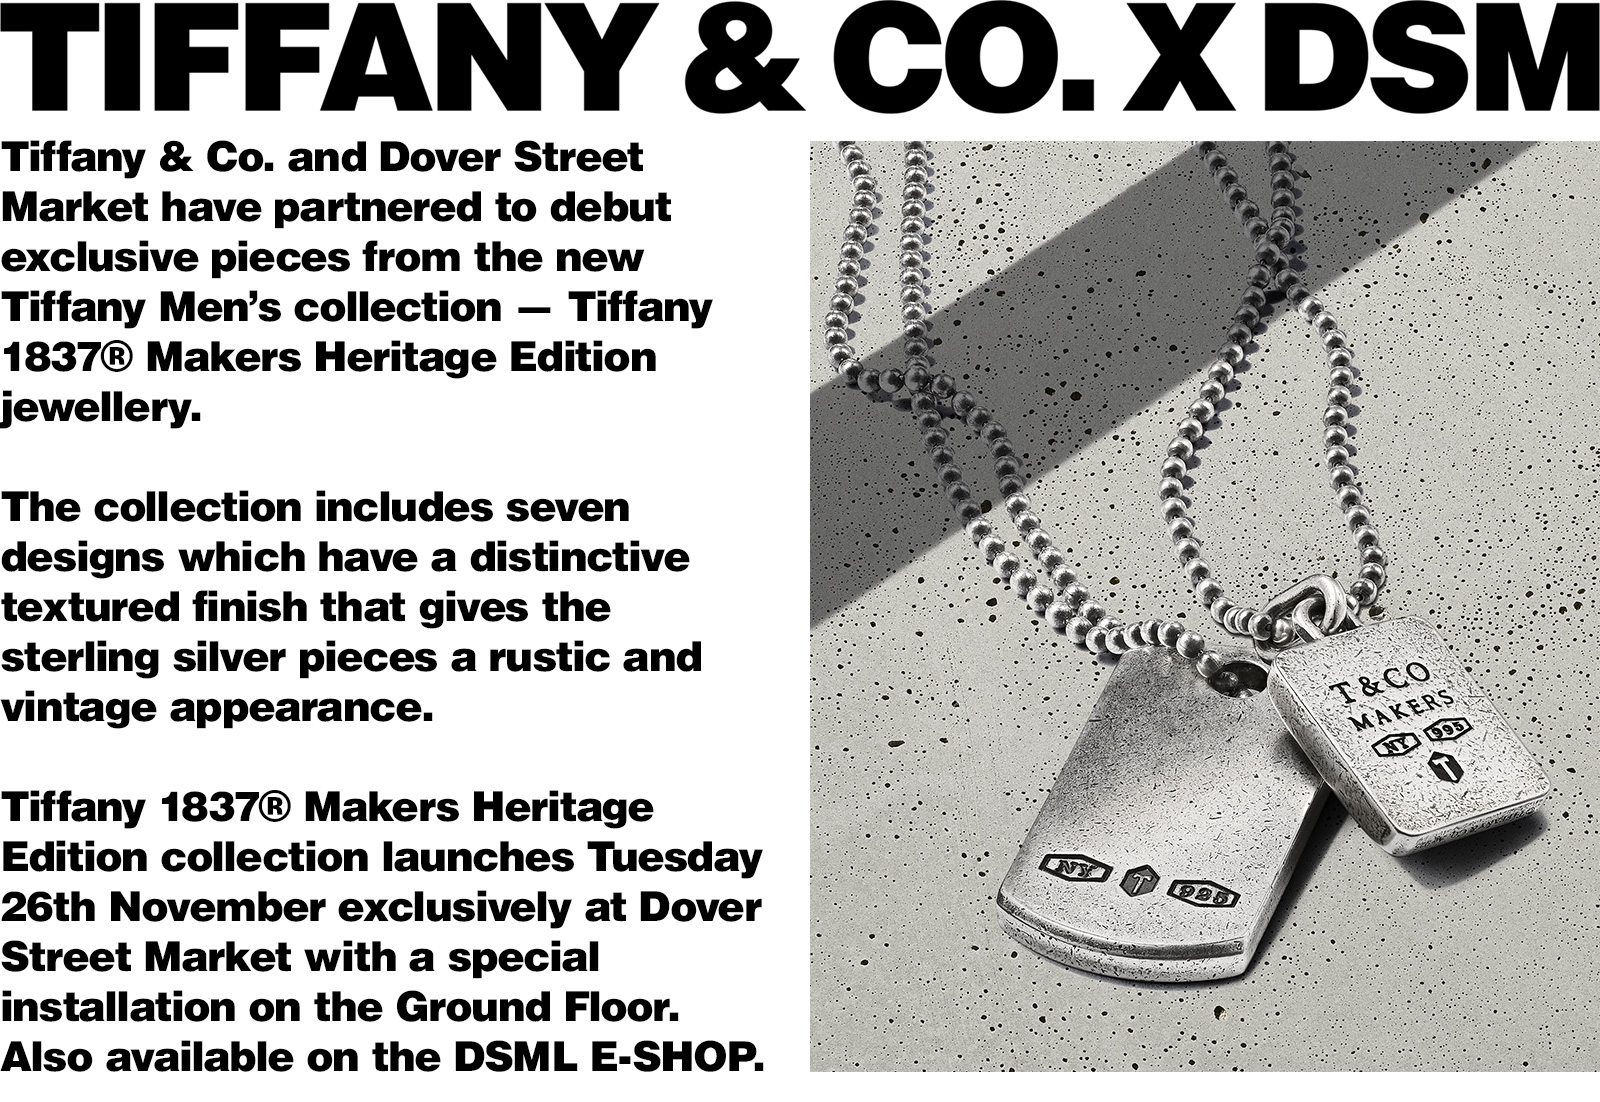 TiffanyxDSM_microsite_London-1.jpg